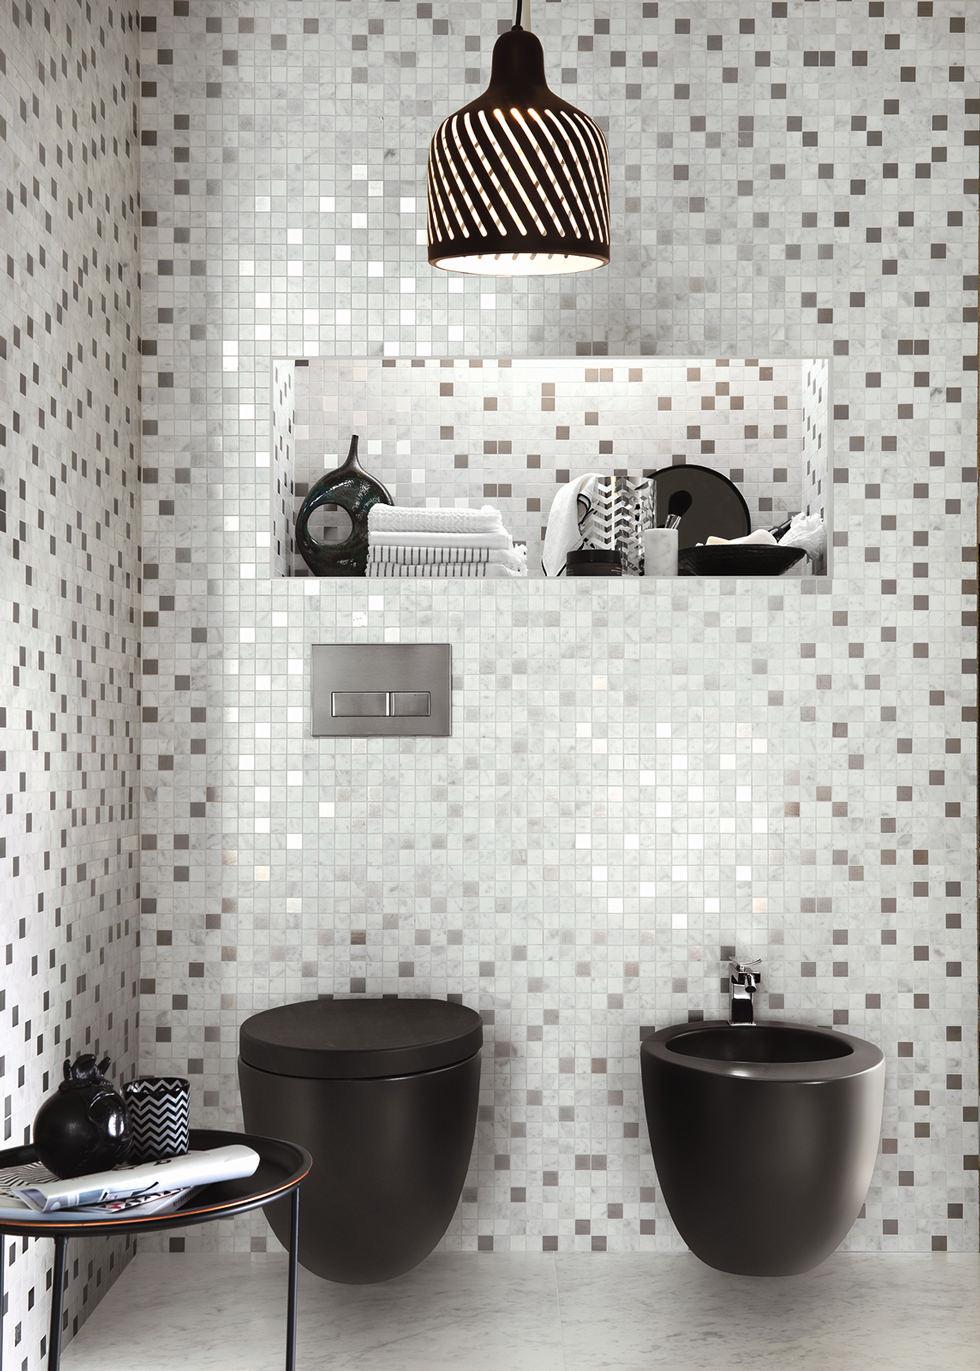 Bagno Moderno Mosaico Bianco E Nero